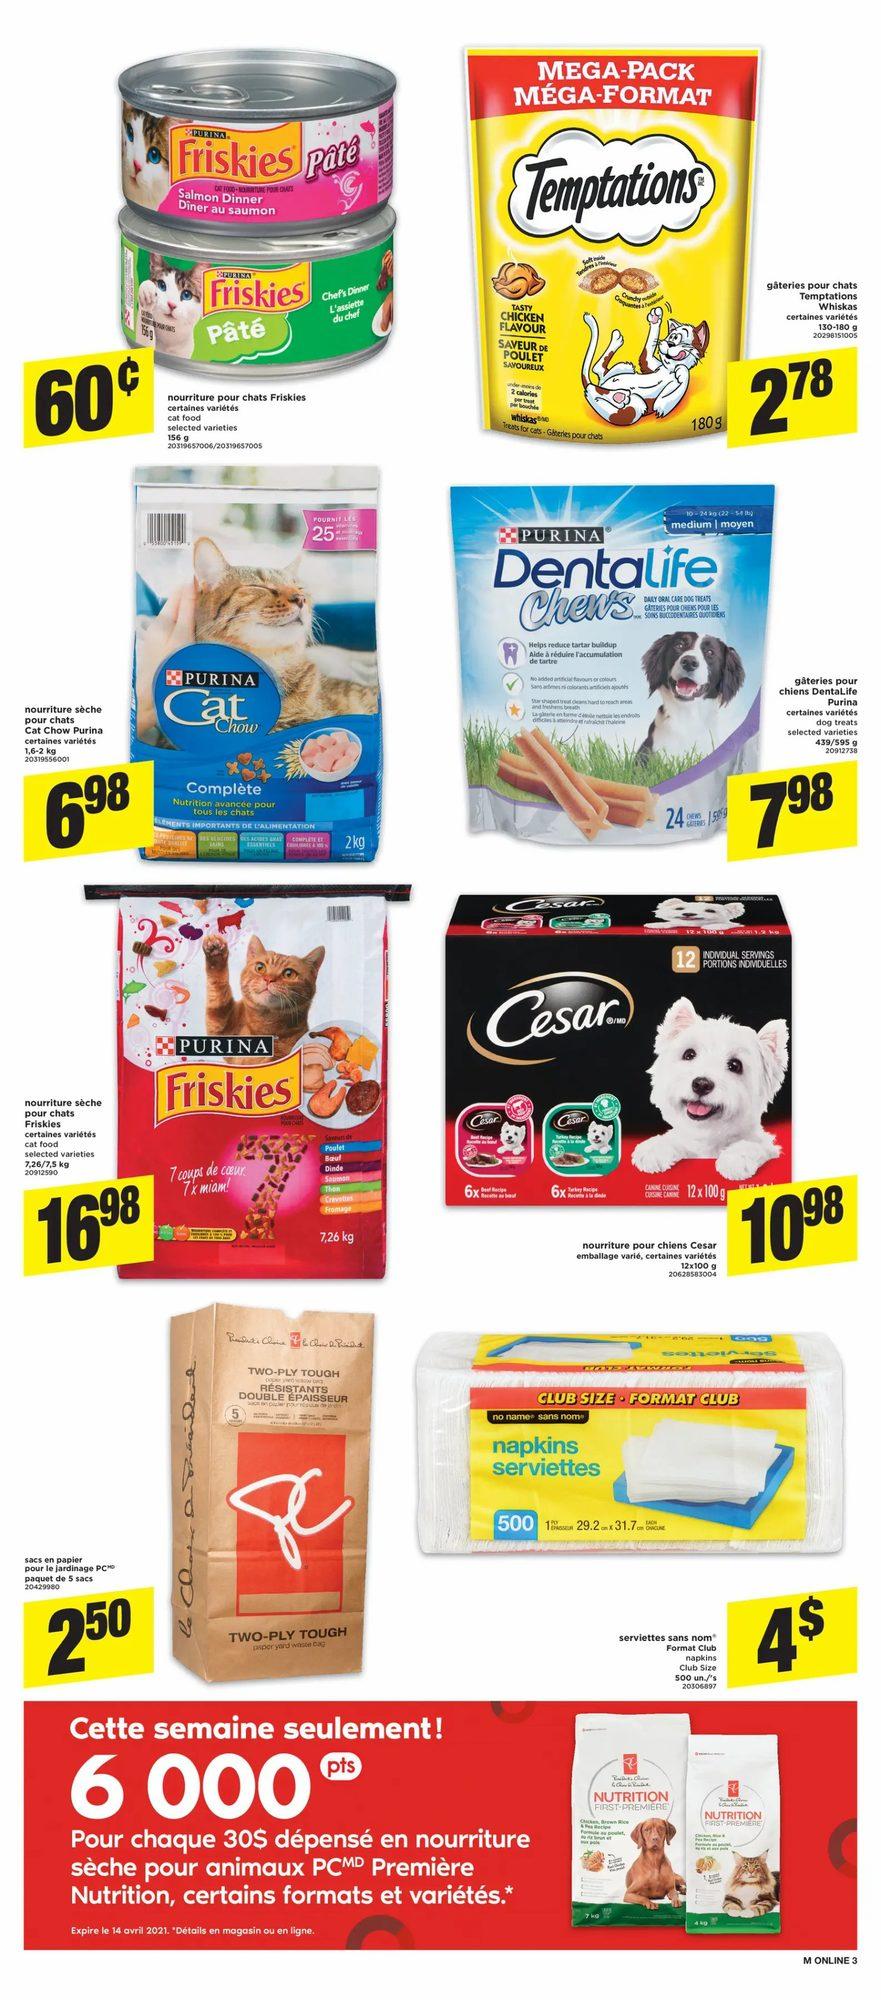 Maxi - Weekly Flyer Specials - Page 9